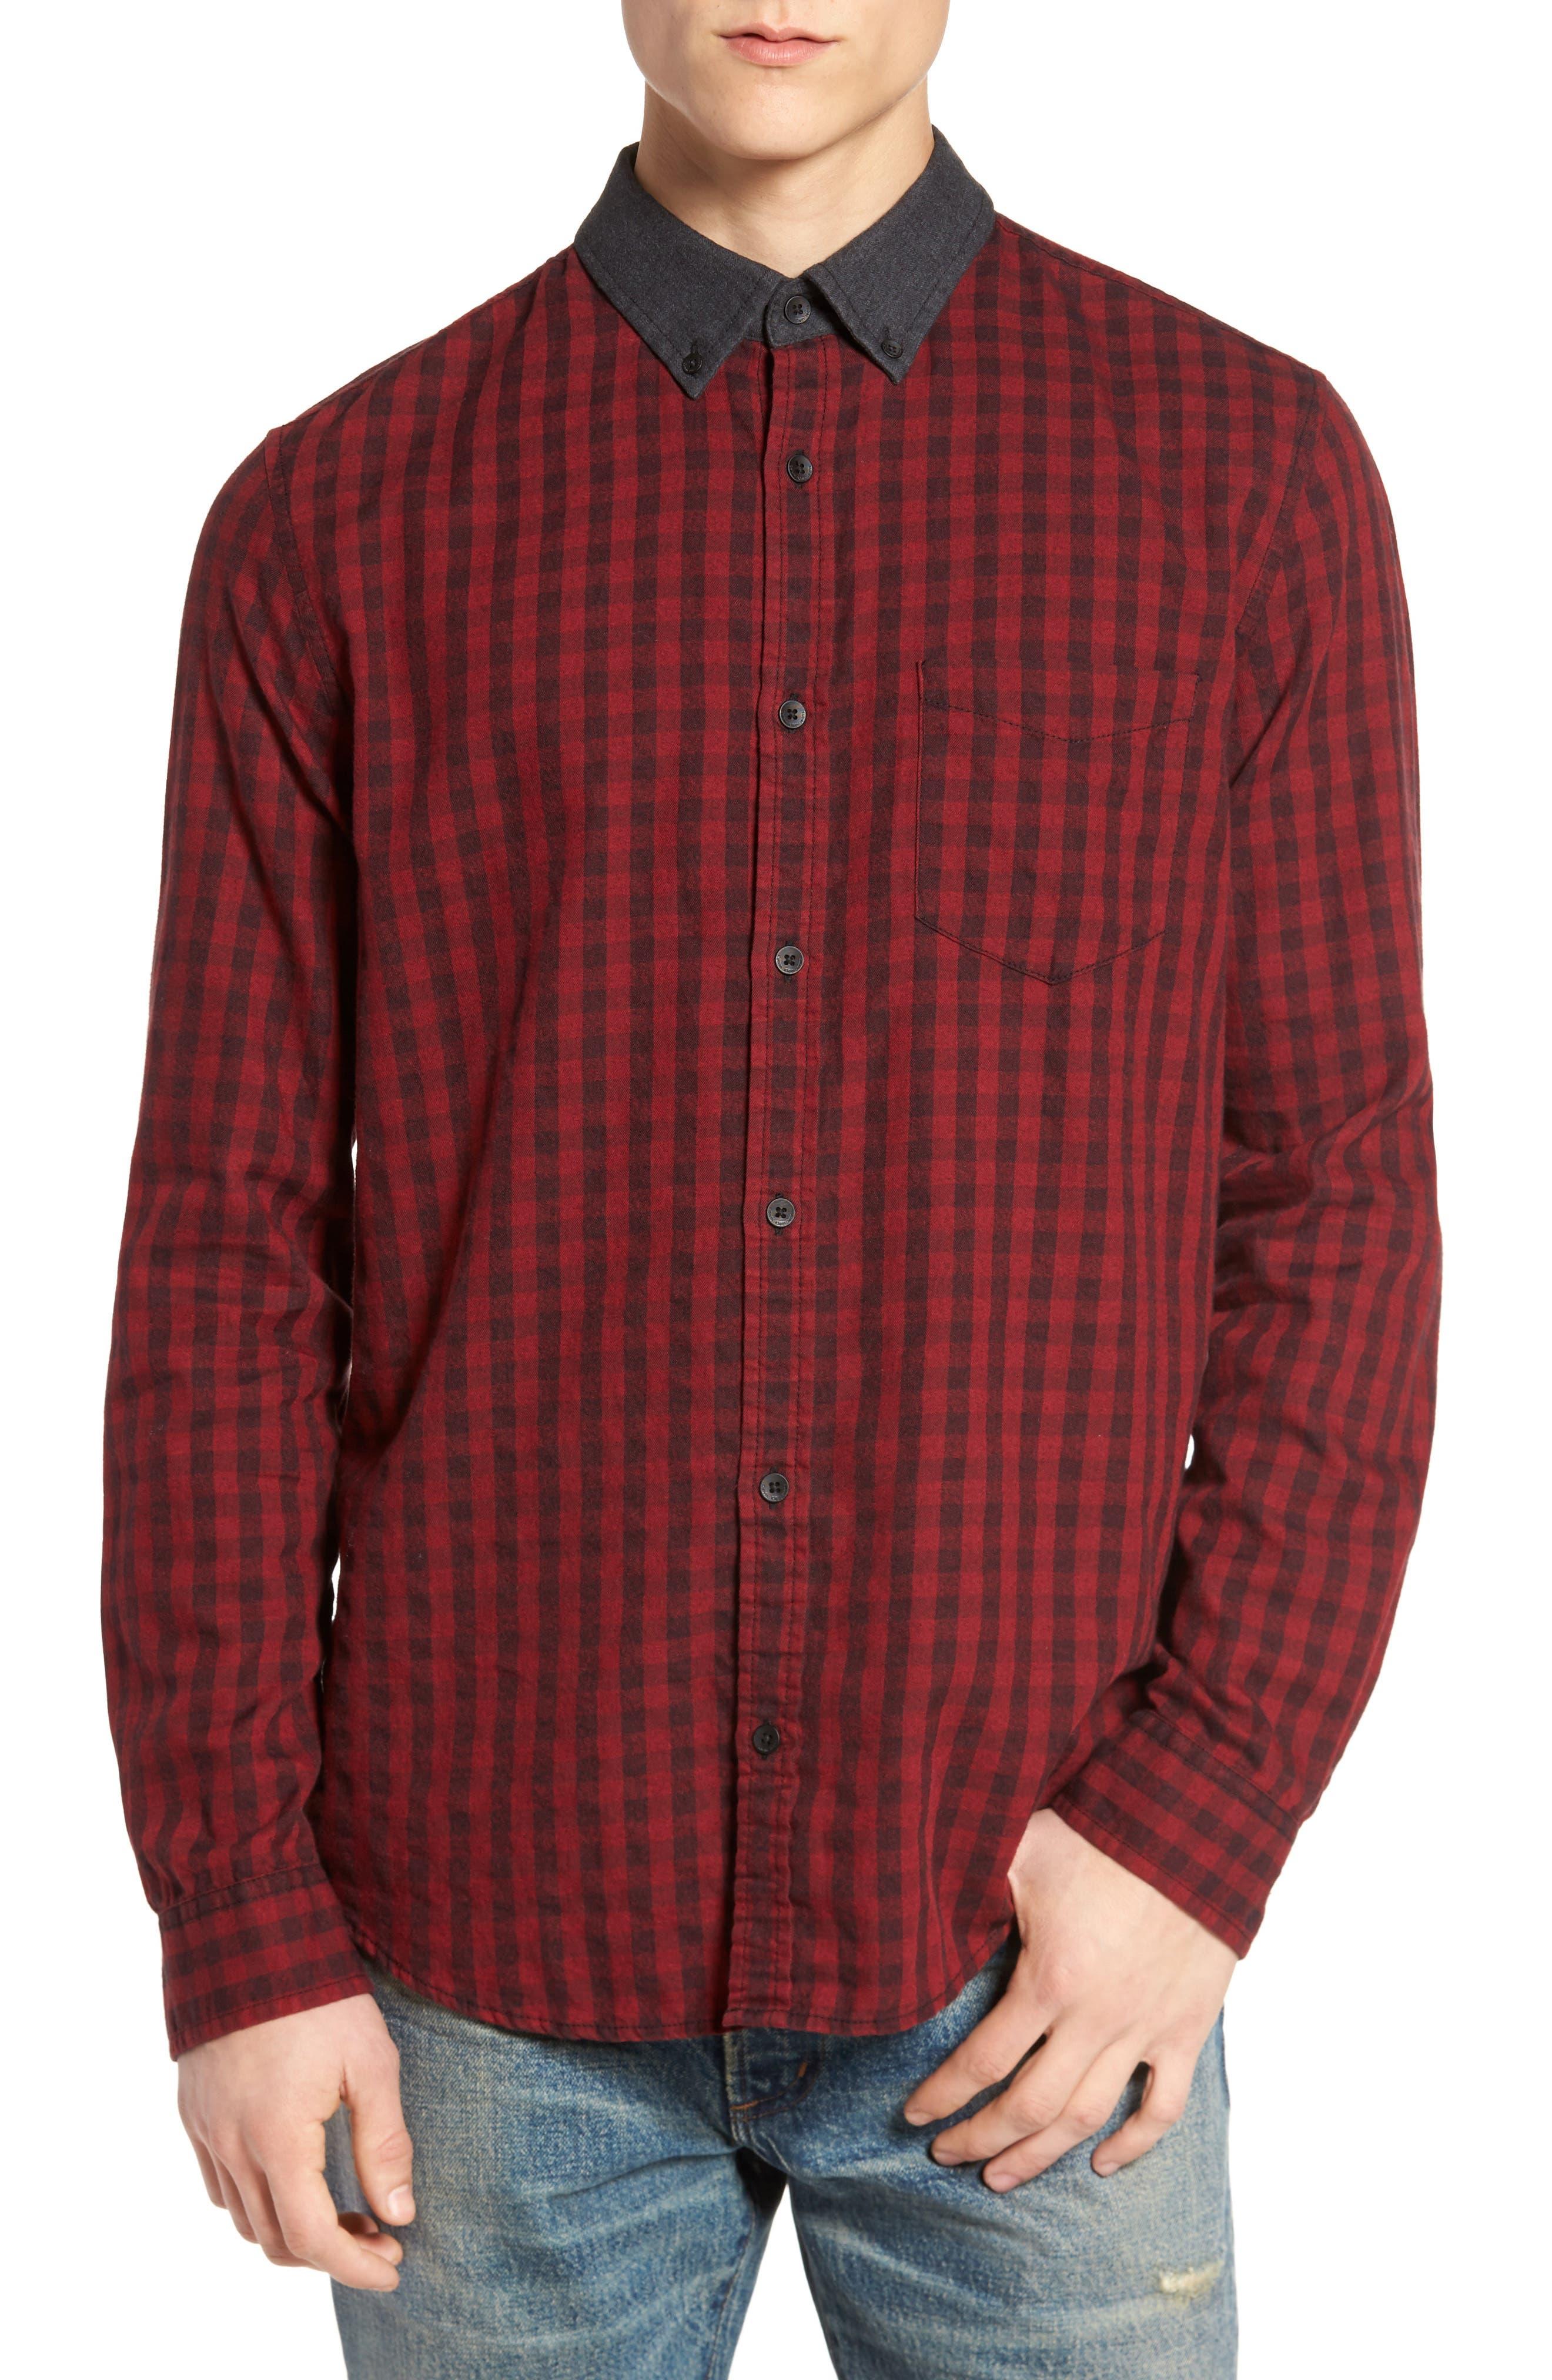 Main Image - Calvin Klein Jeans Barn Flannel Shirt